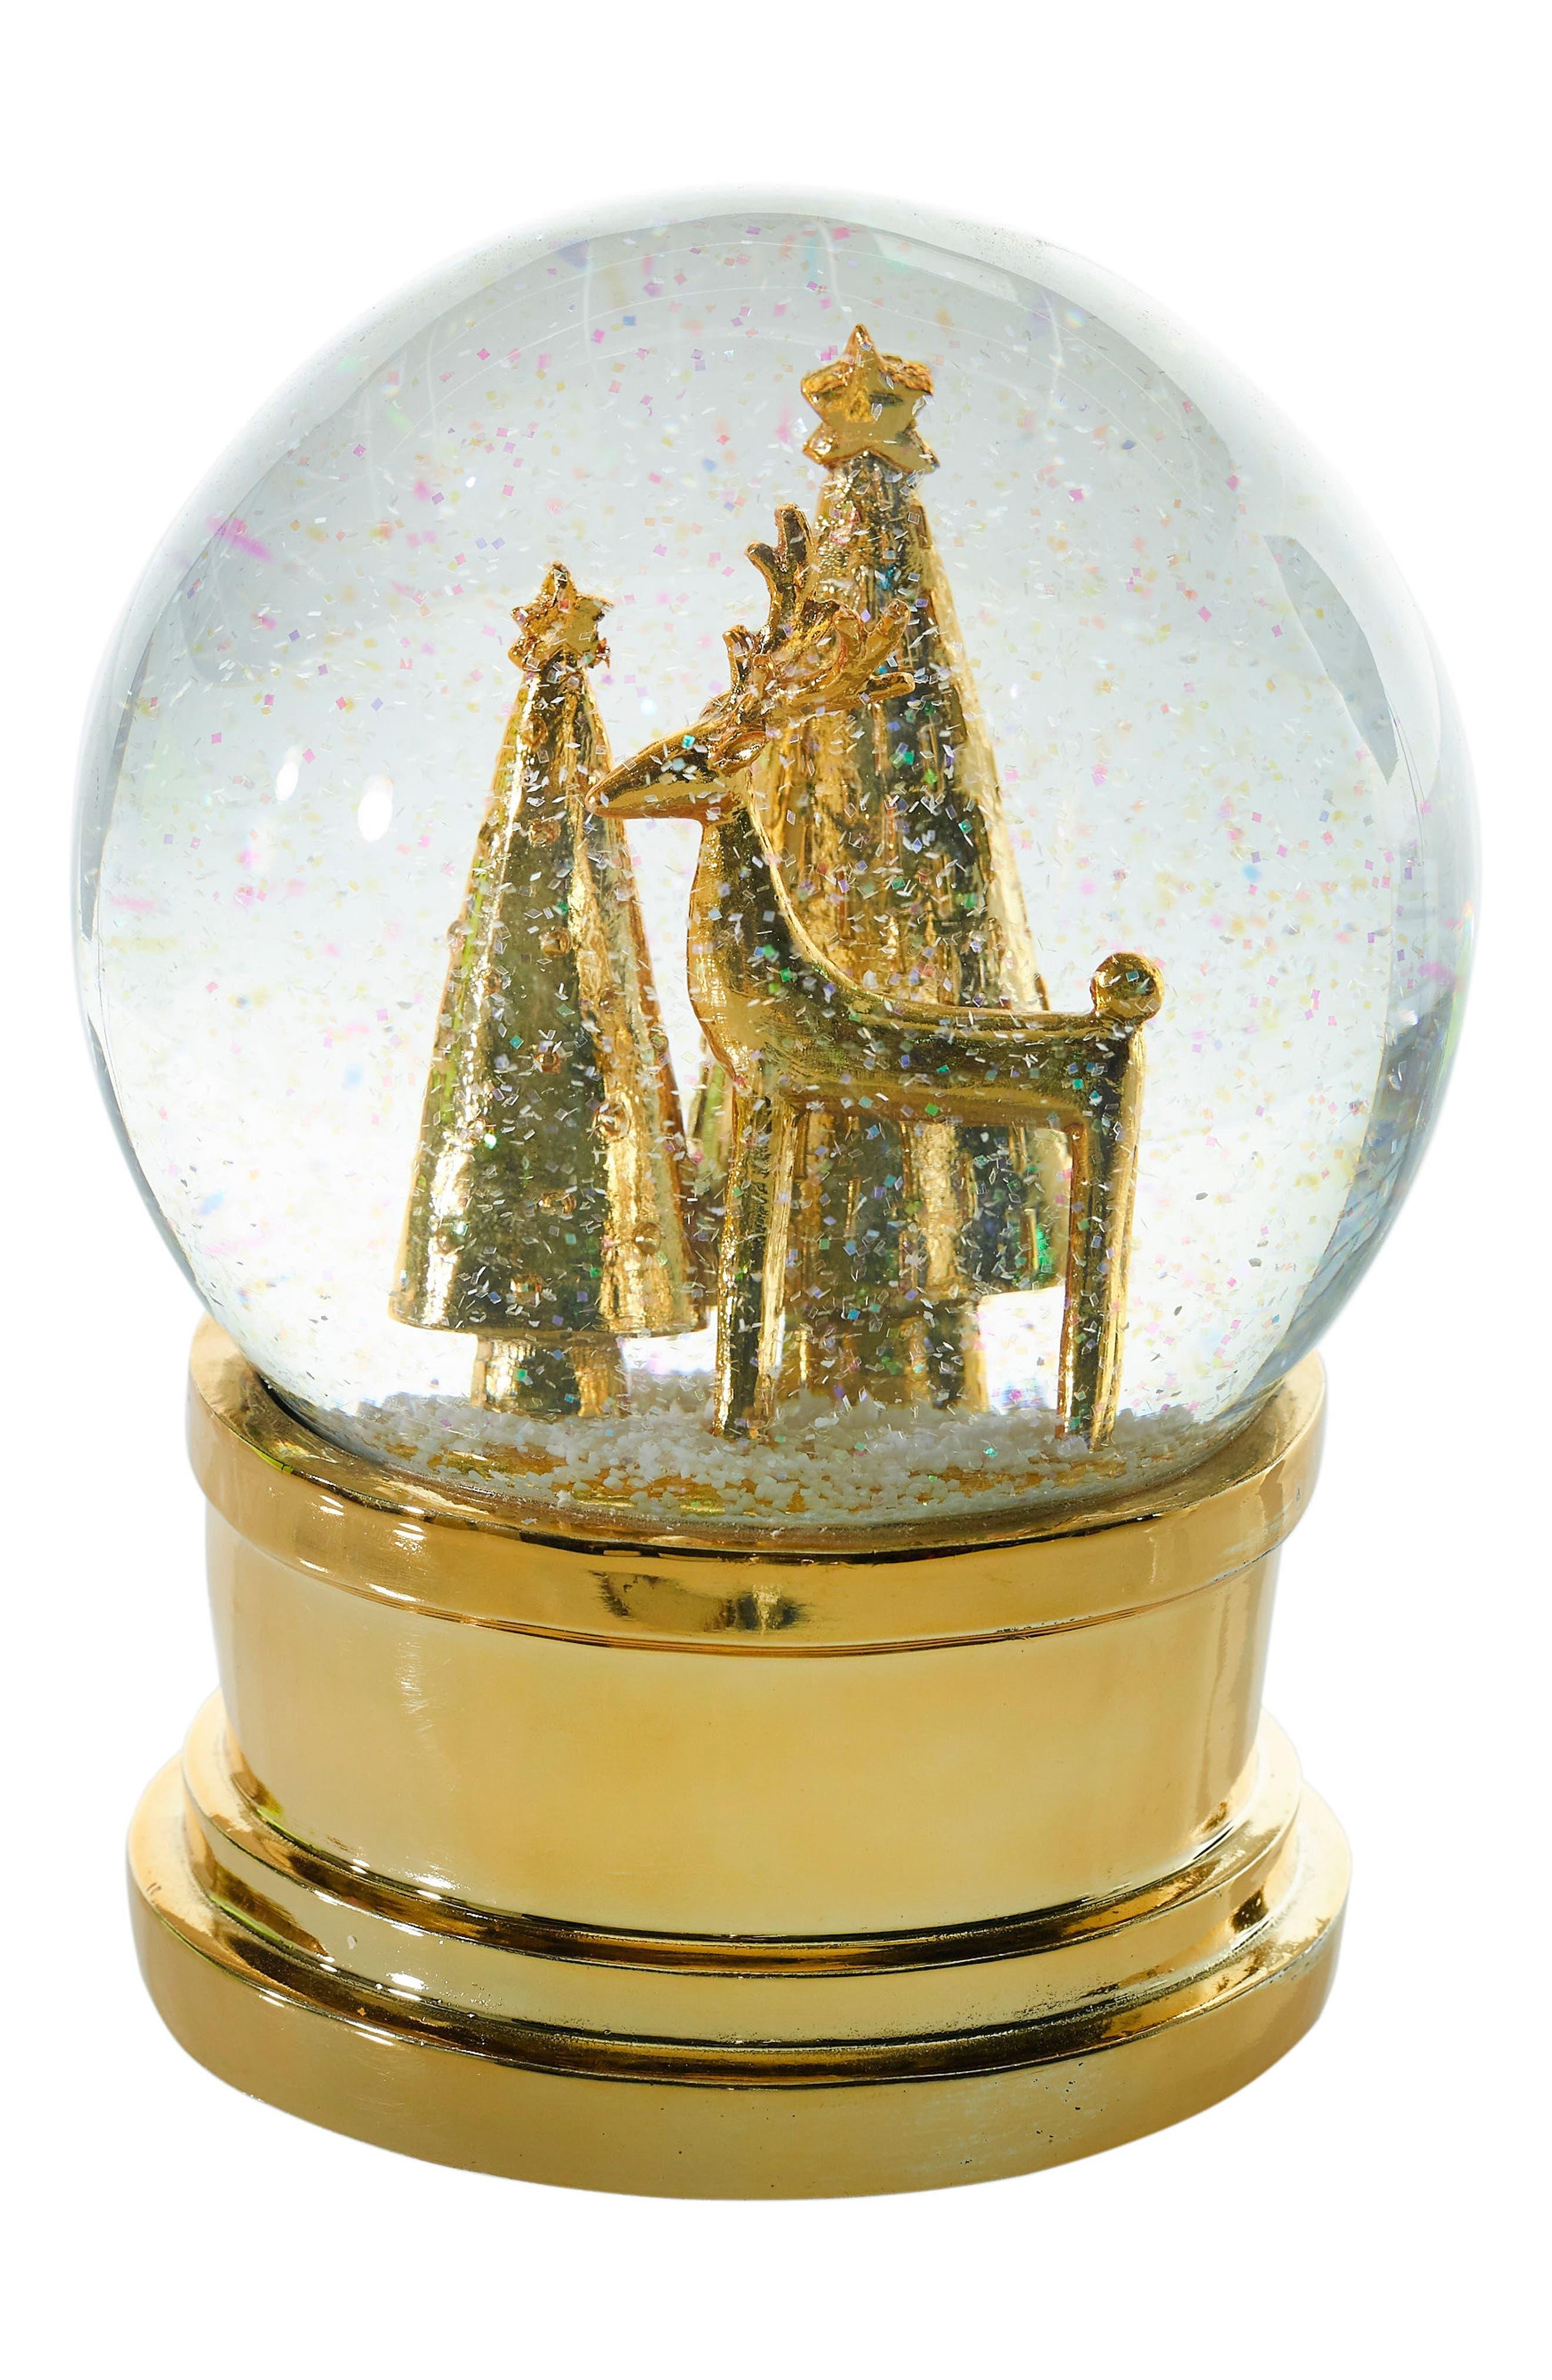 Main Image - Accent Decor Snow Globe